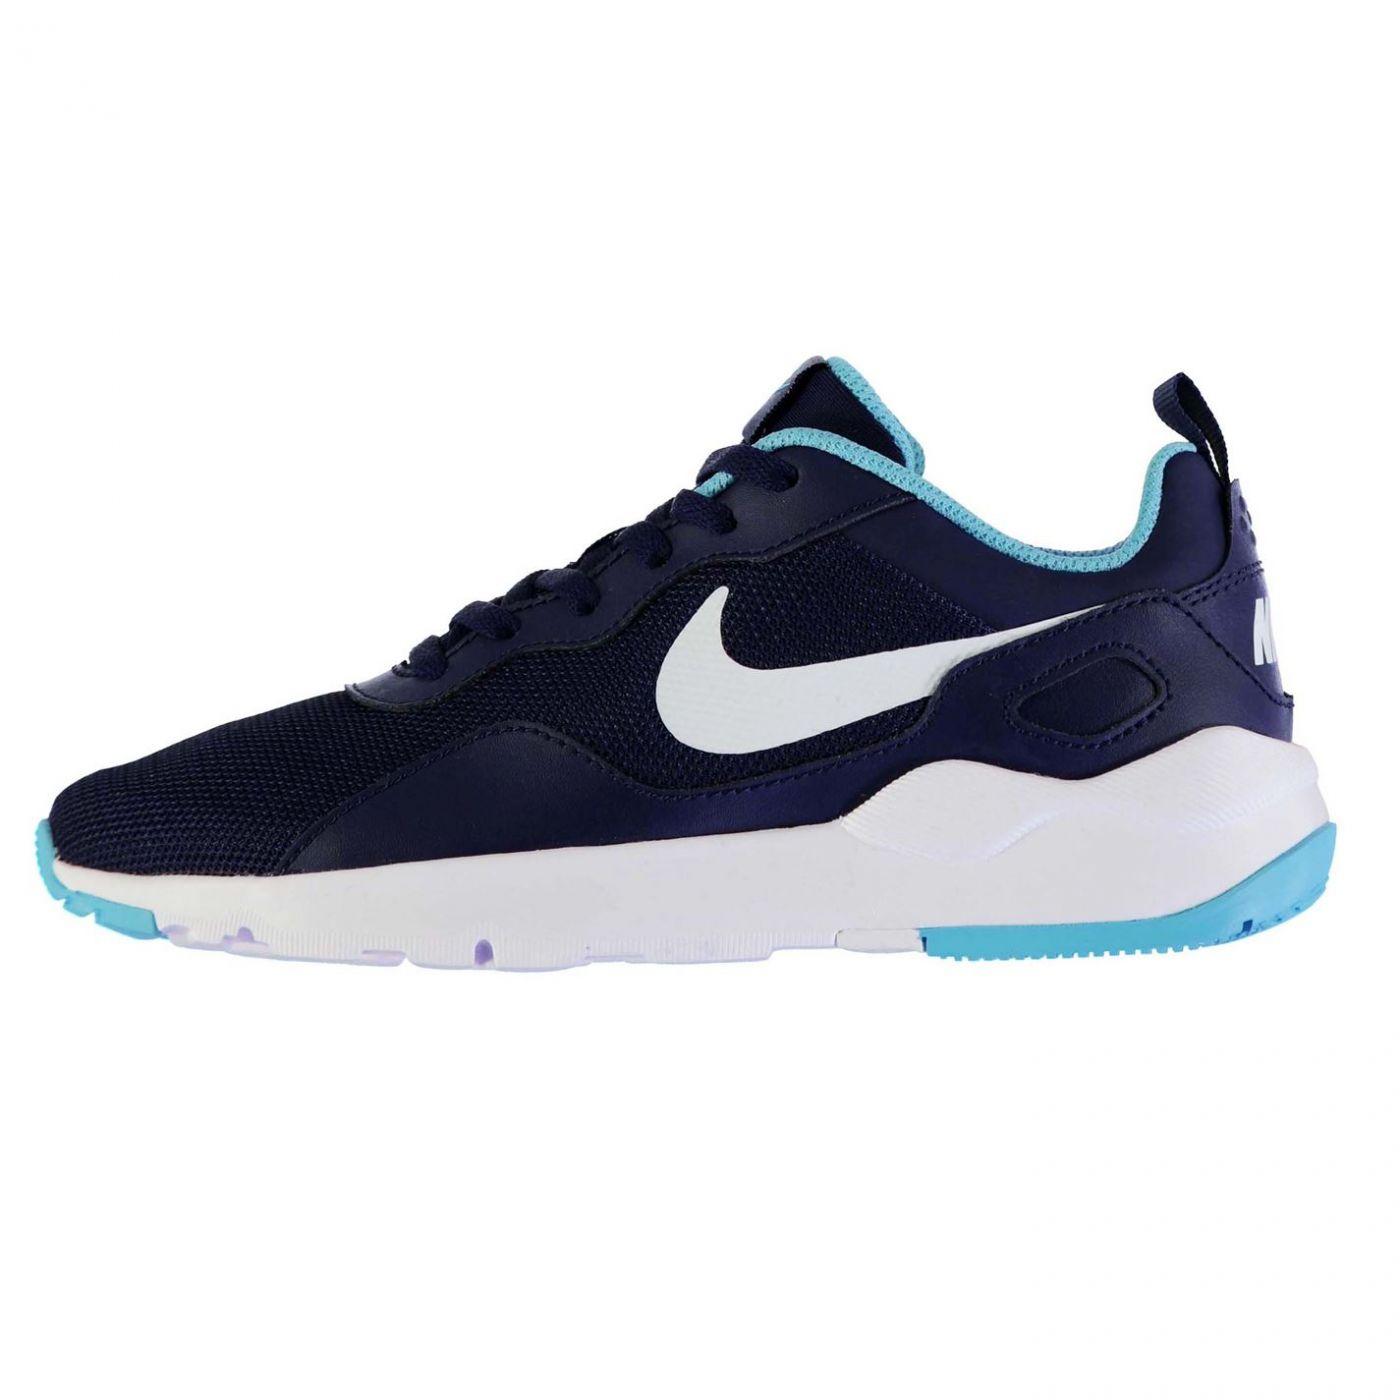 Mentor Marketing de motores de búsqueda administración  Nike LD Runner Stargazer Junior Girls Trainers